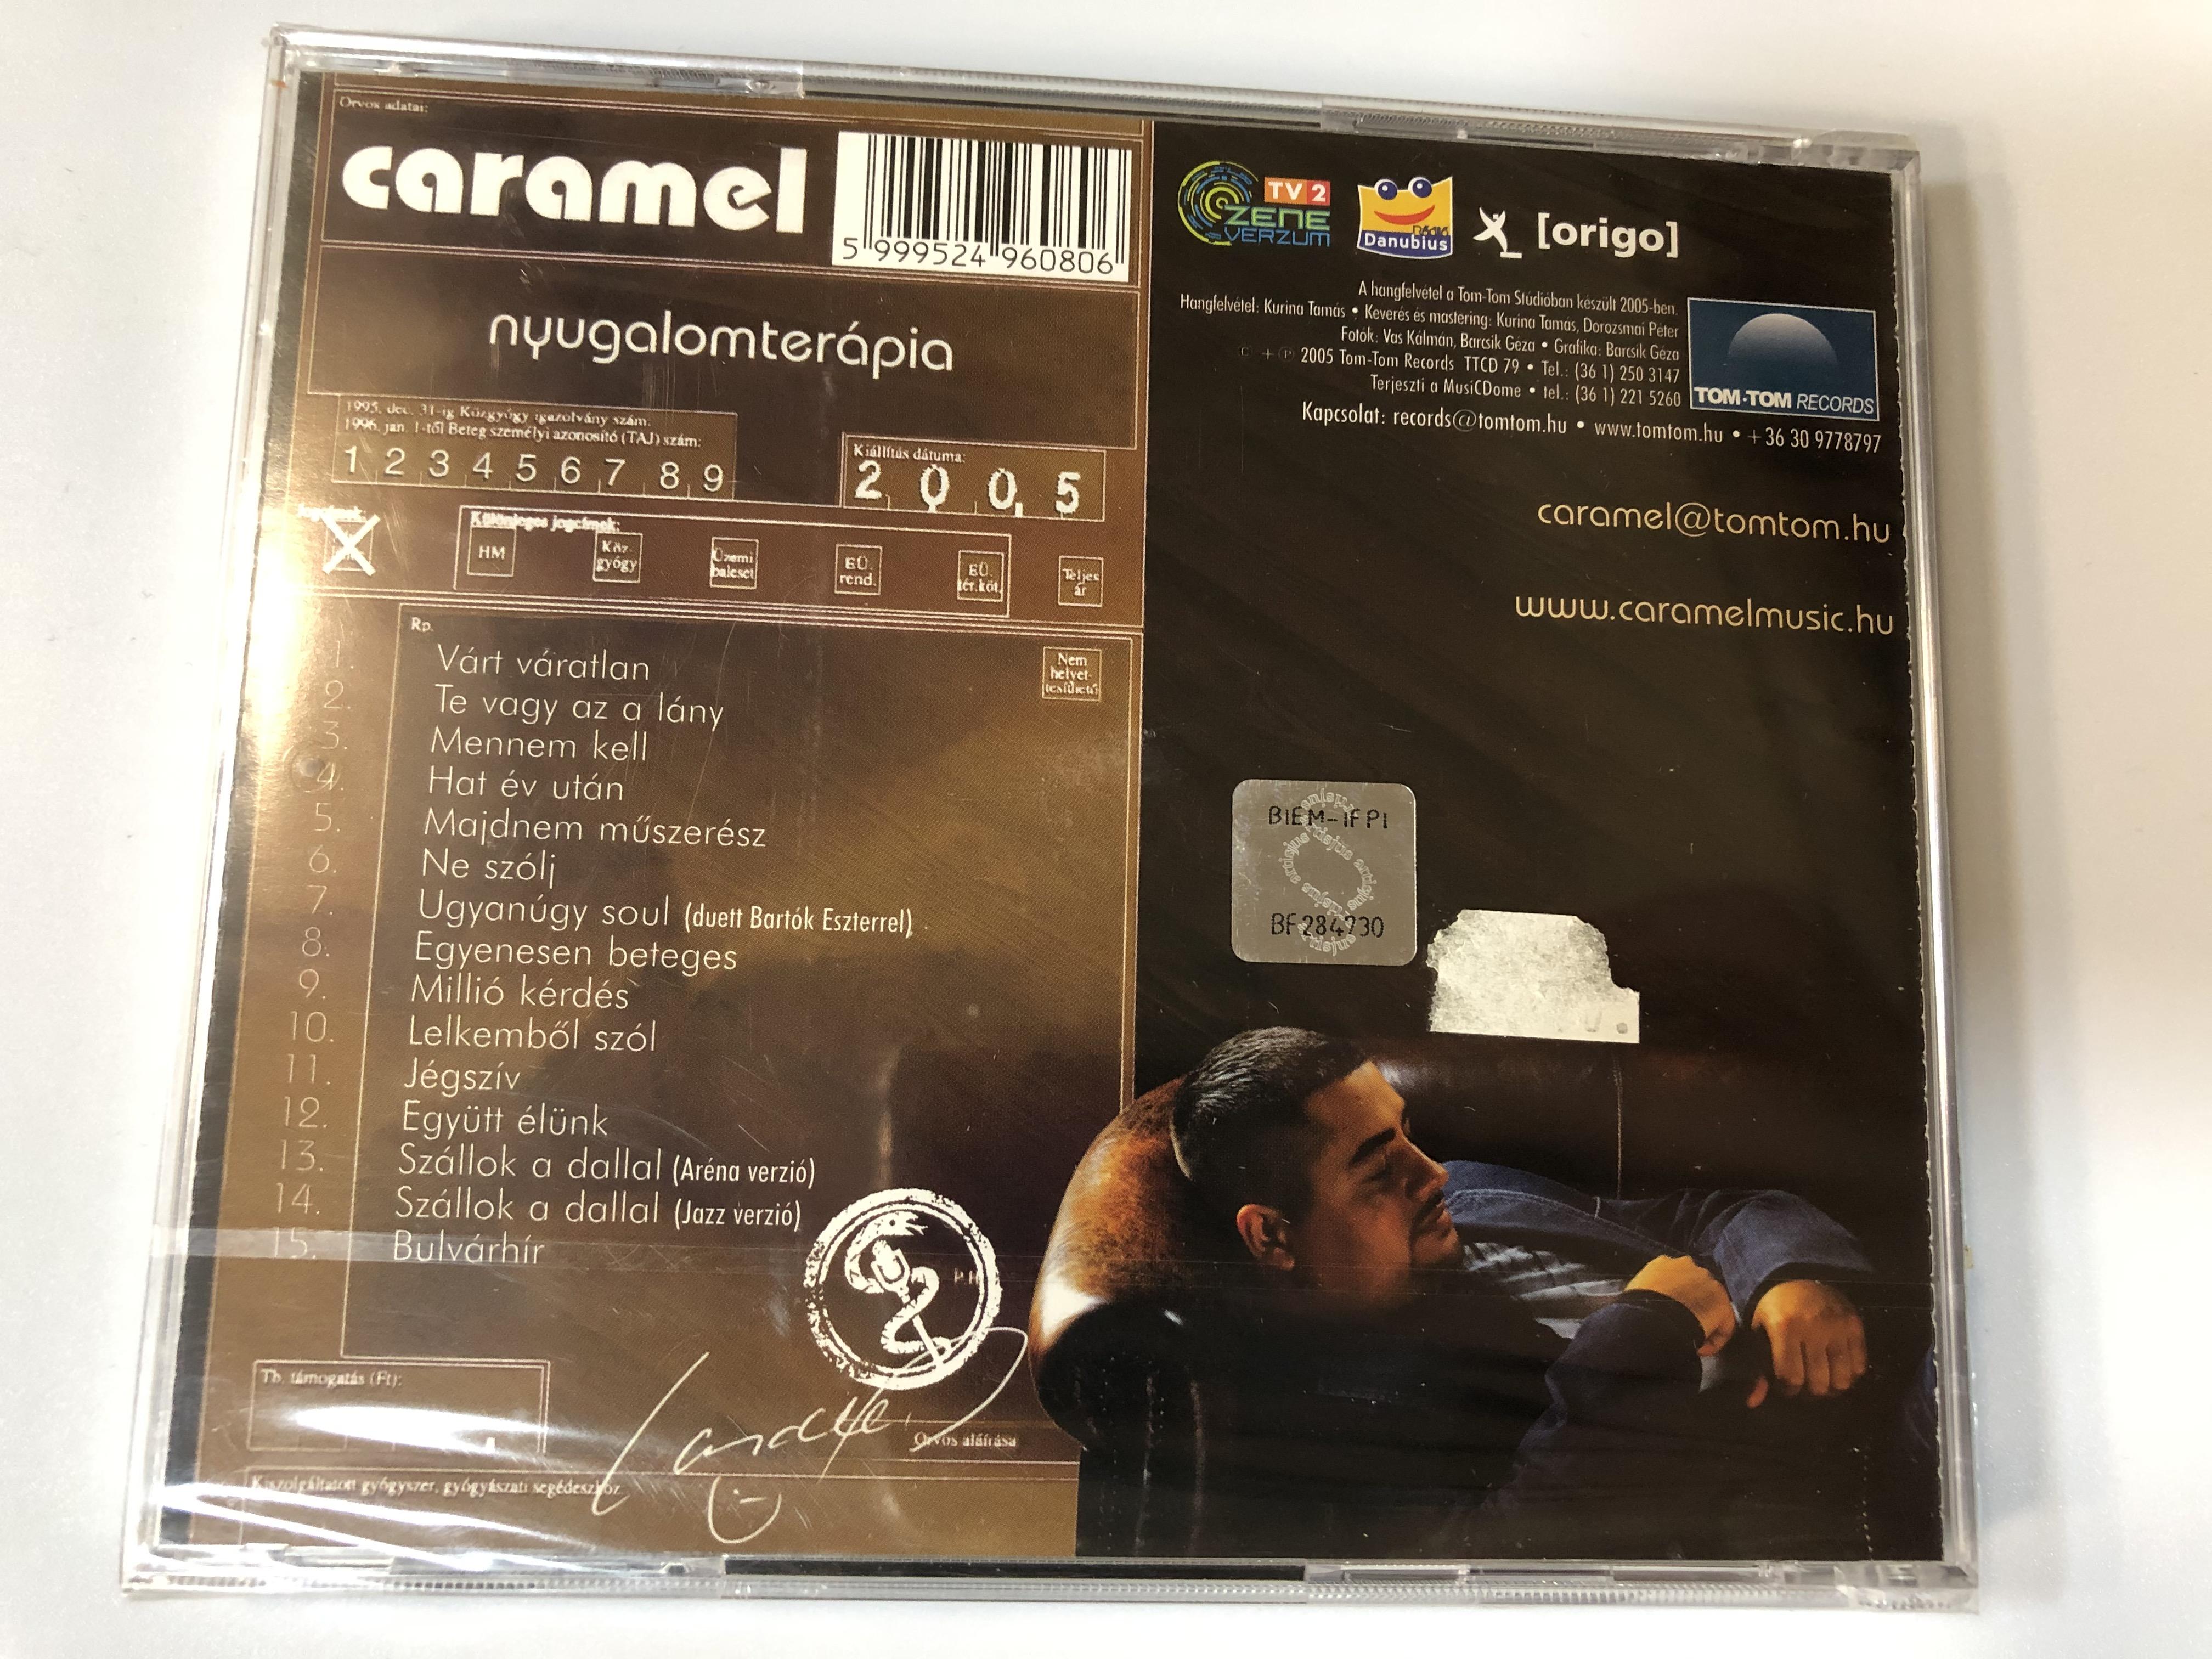 caramel-nyugalomter-pia-tom-tom-records-audio-cd-2005-ttcd-79-2-.jpg